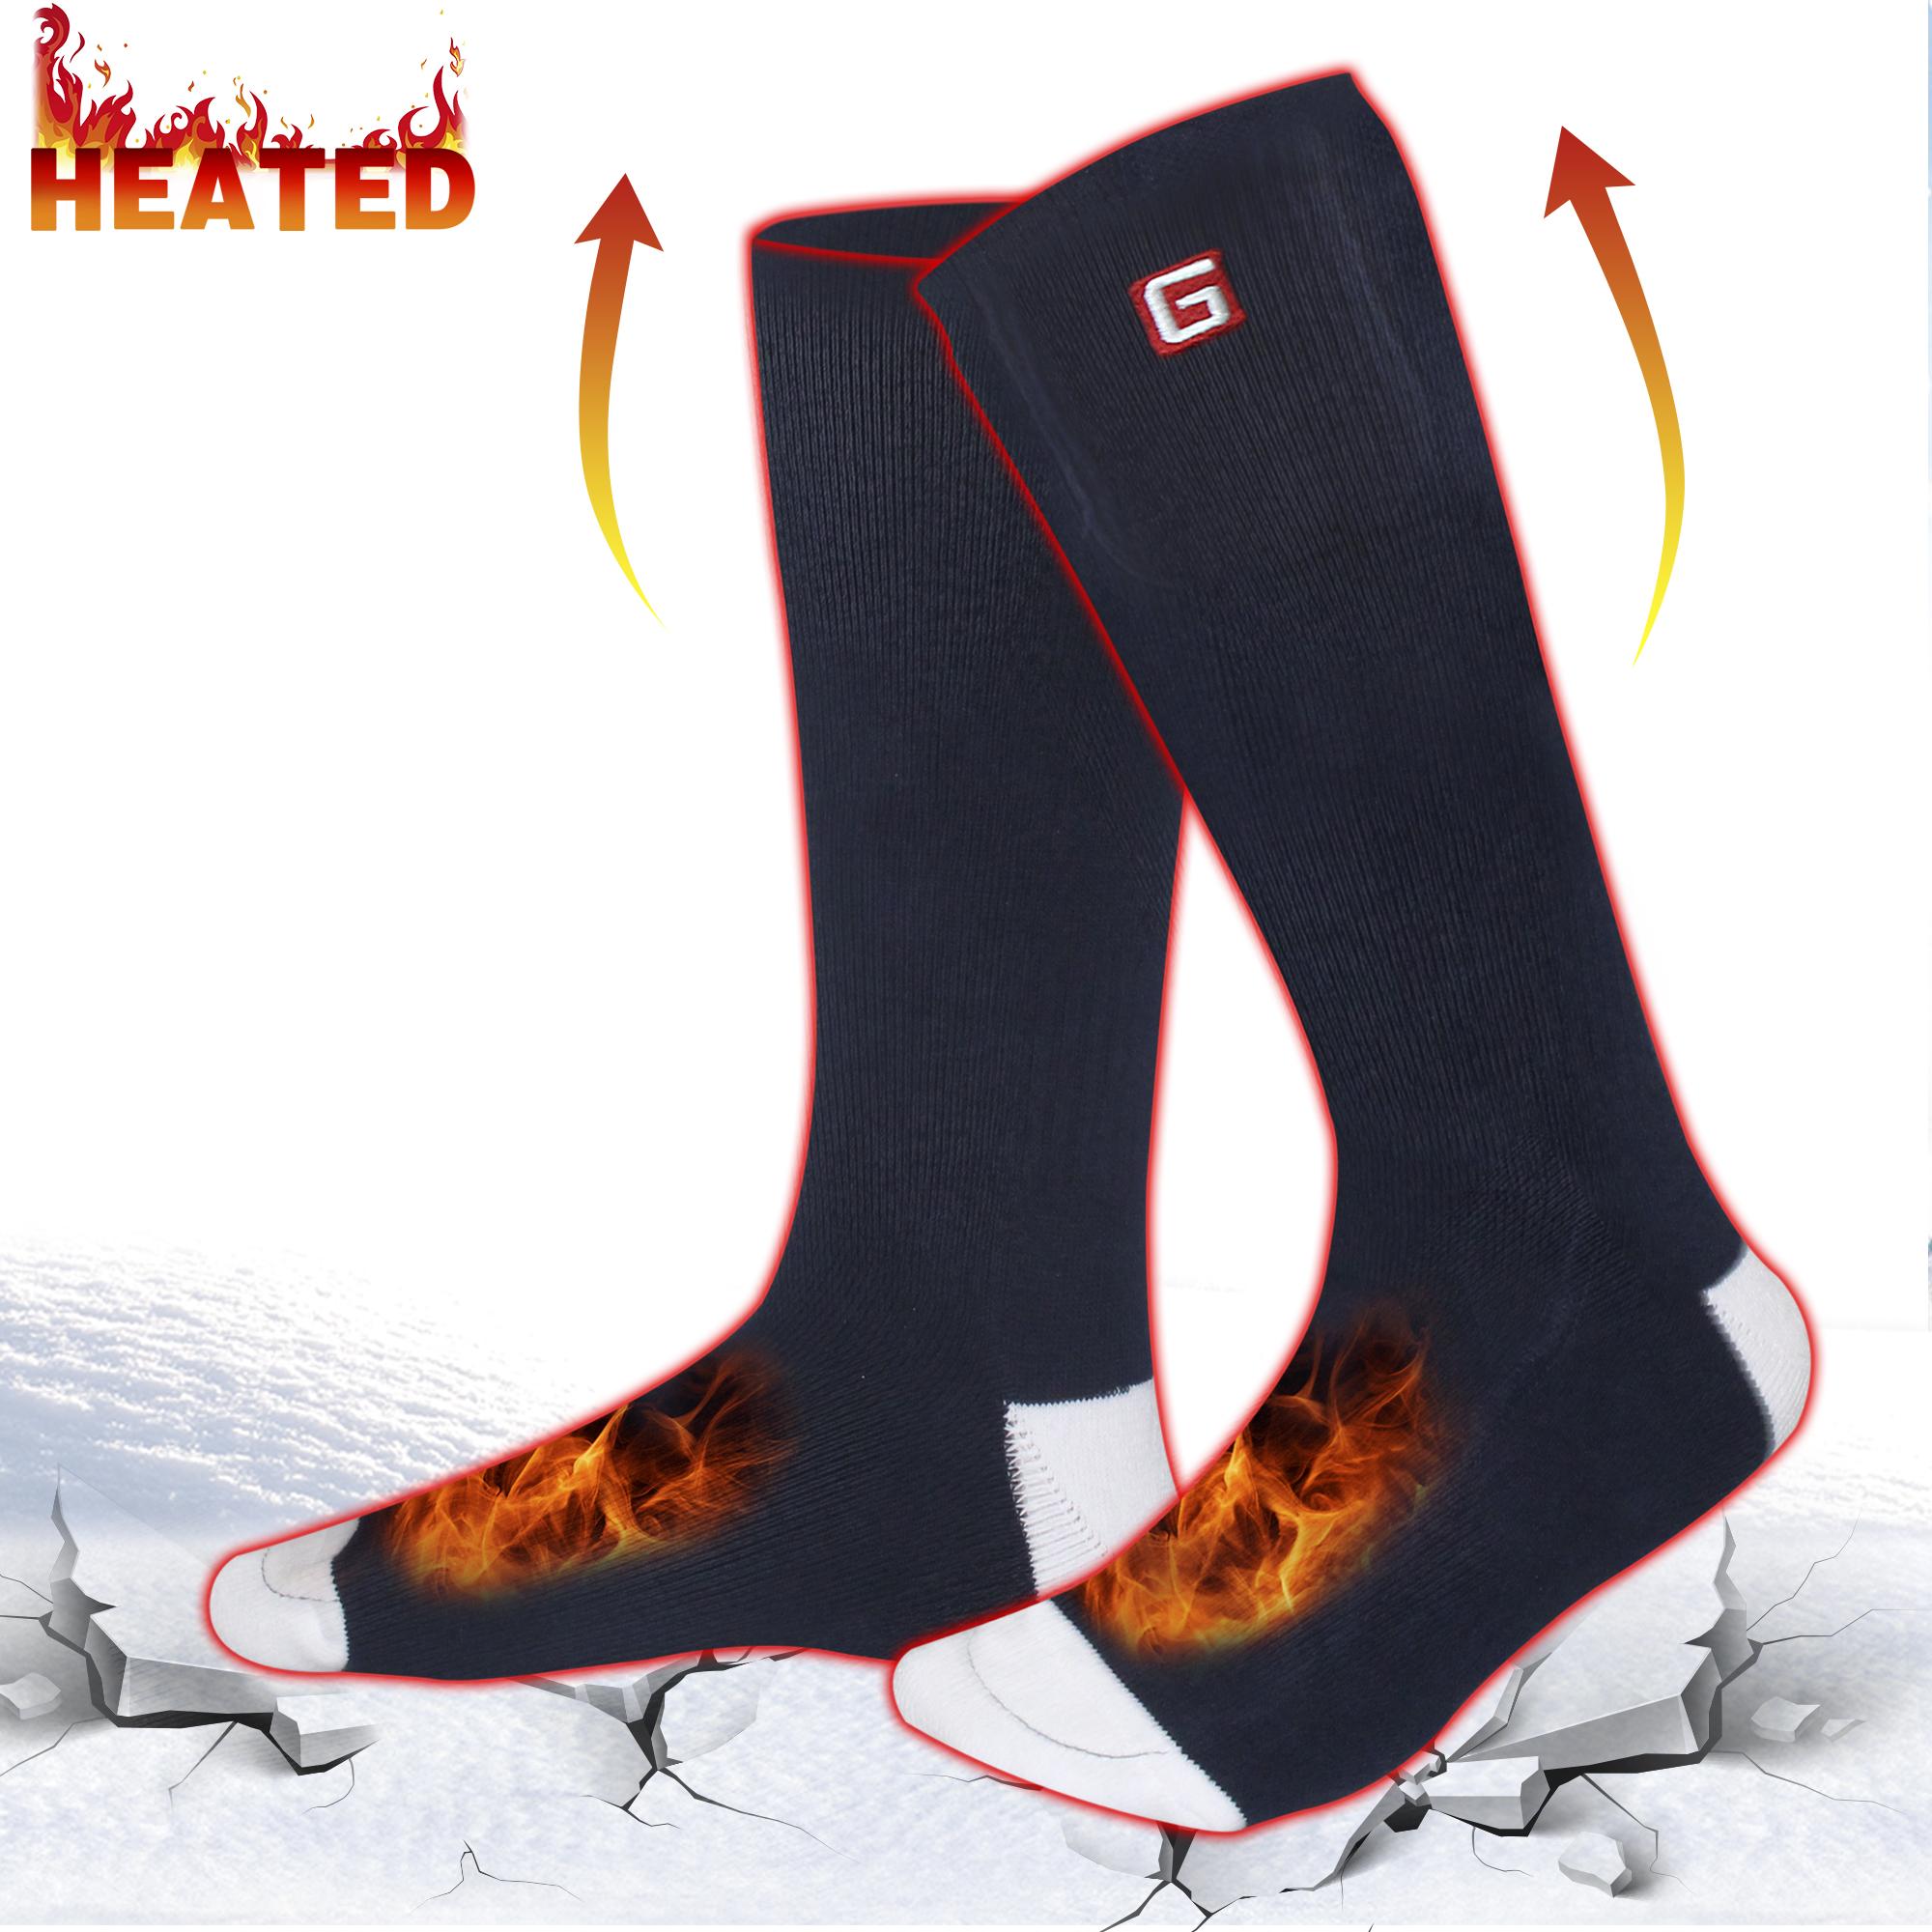 Heated Clothing Electric Clothing Heated Socks Heated Gloves >> Electric Heated Socks Men 3 7v Cold Winter Warm Skiing Socks